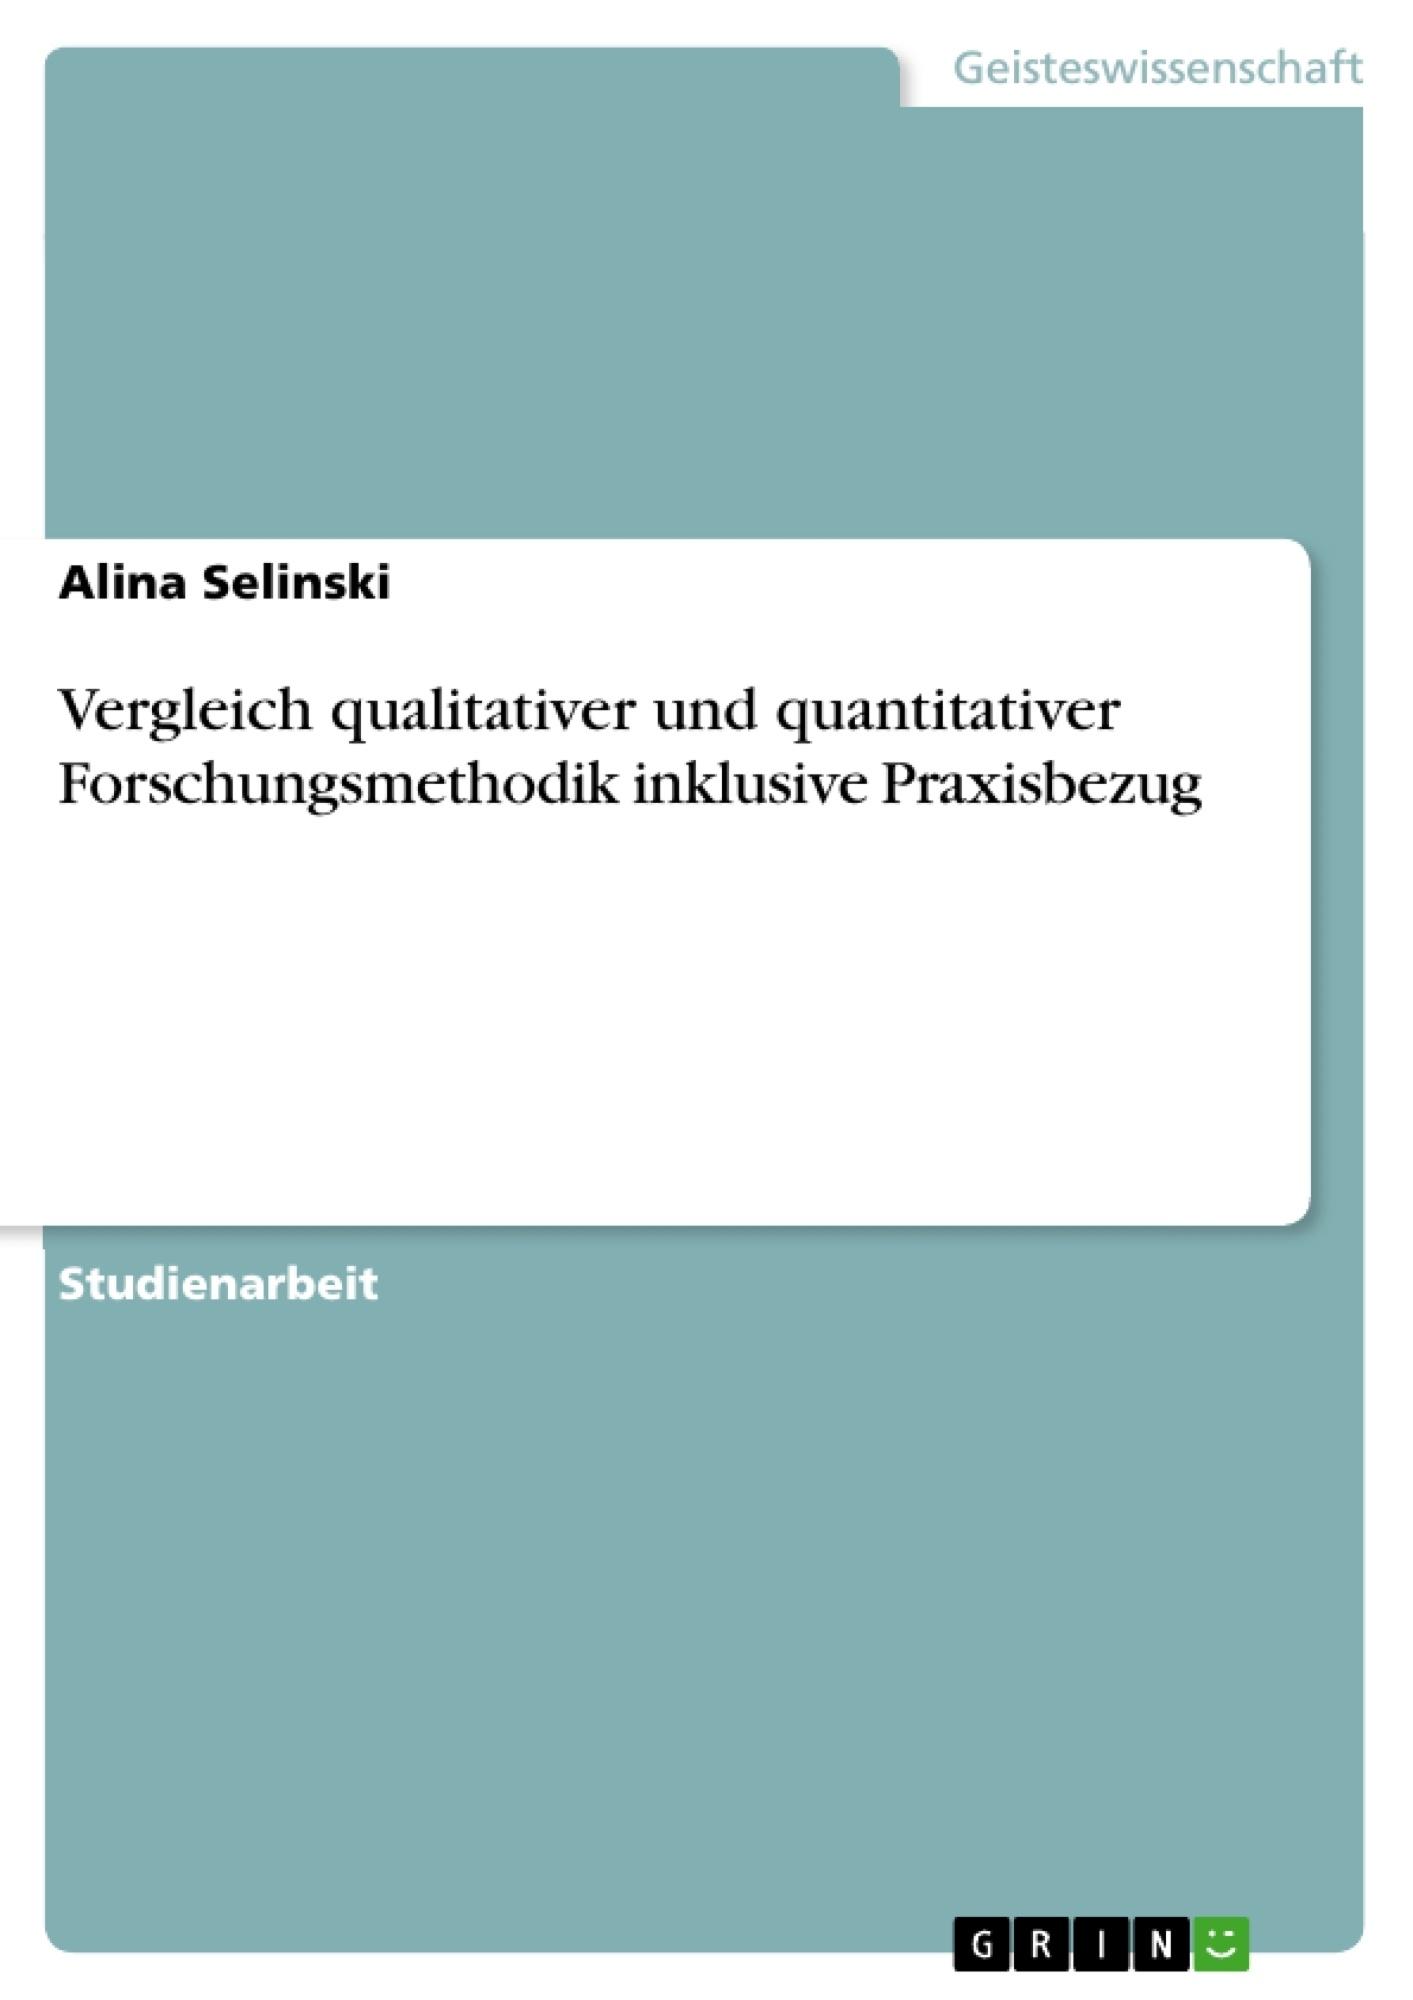 Titel: Vergleich qualitativer und quantitativer Forschungsmethodik inklusive Praxisbezug